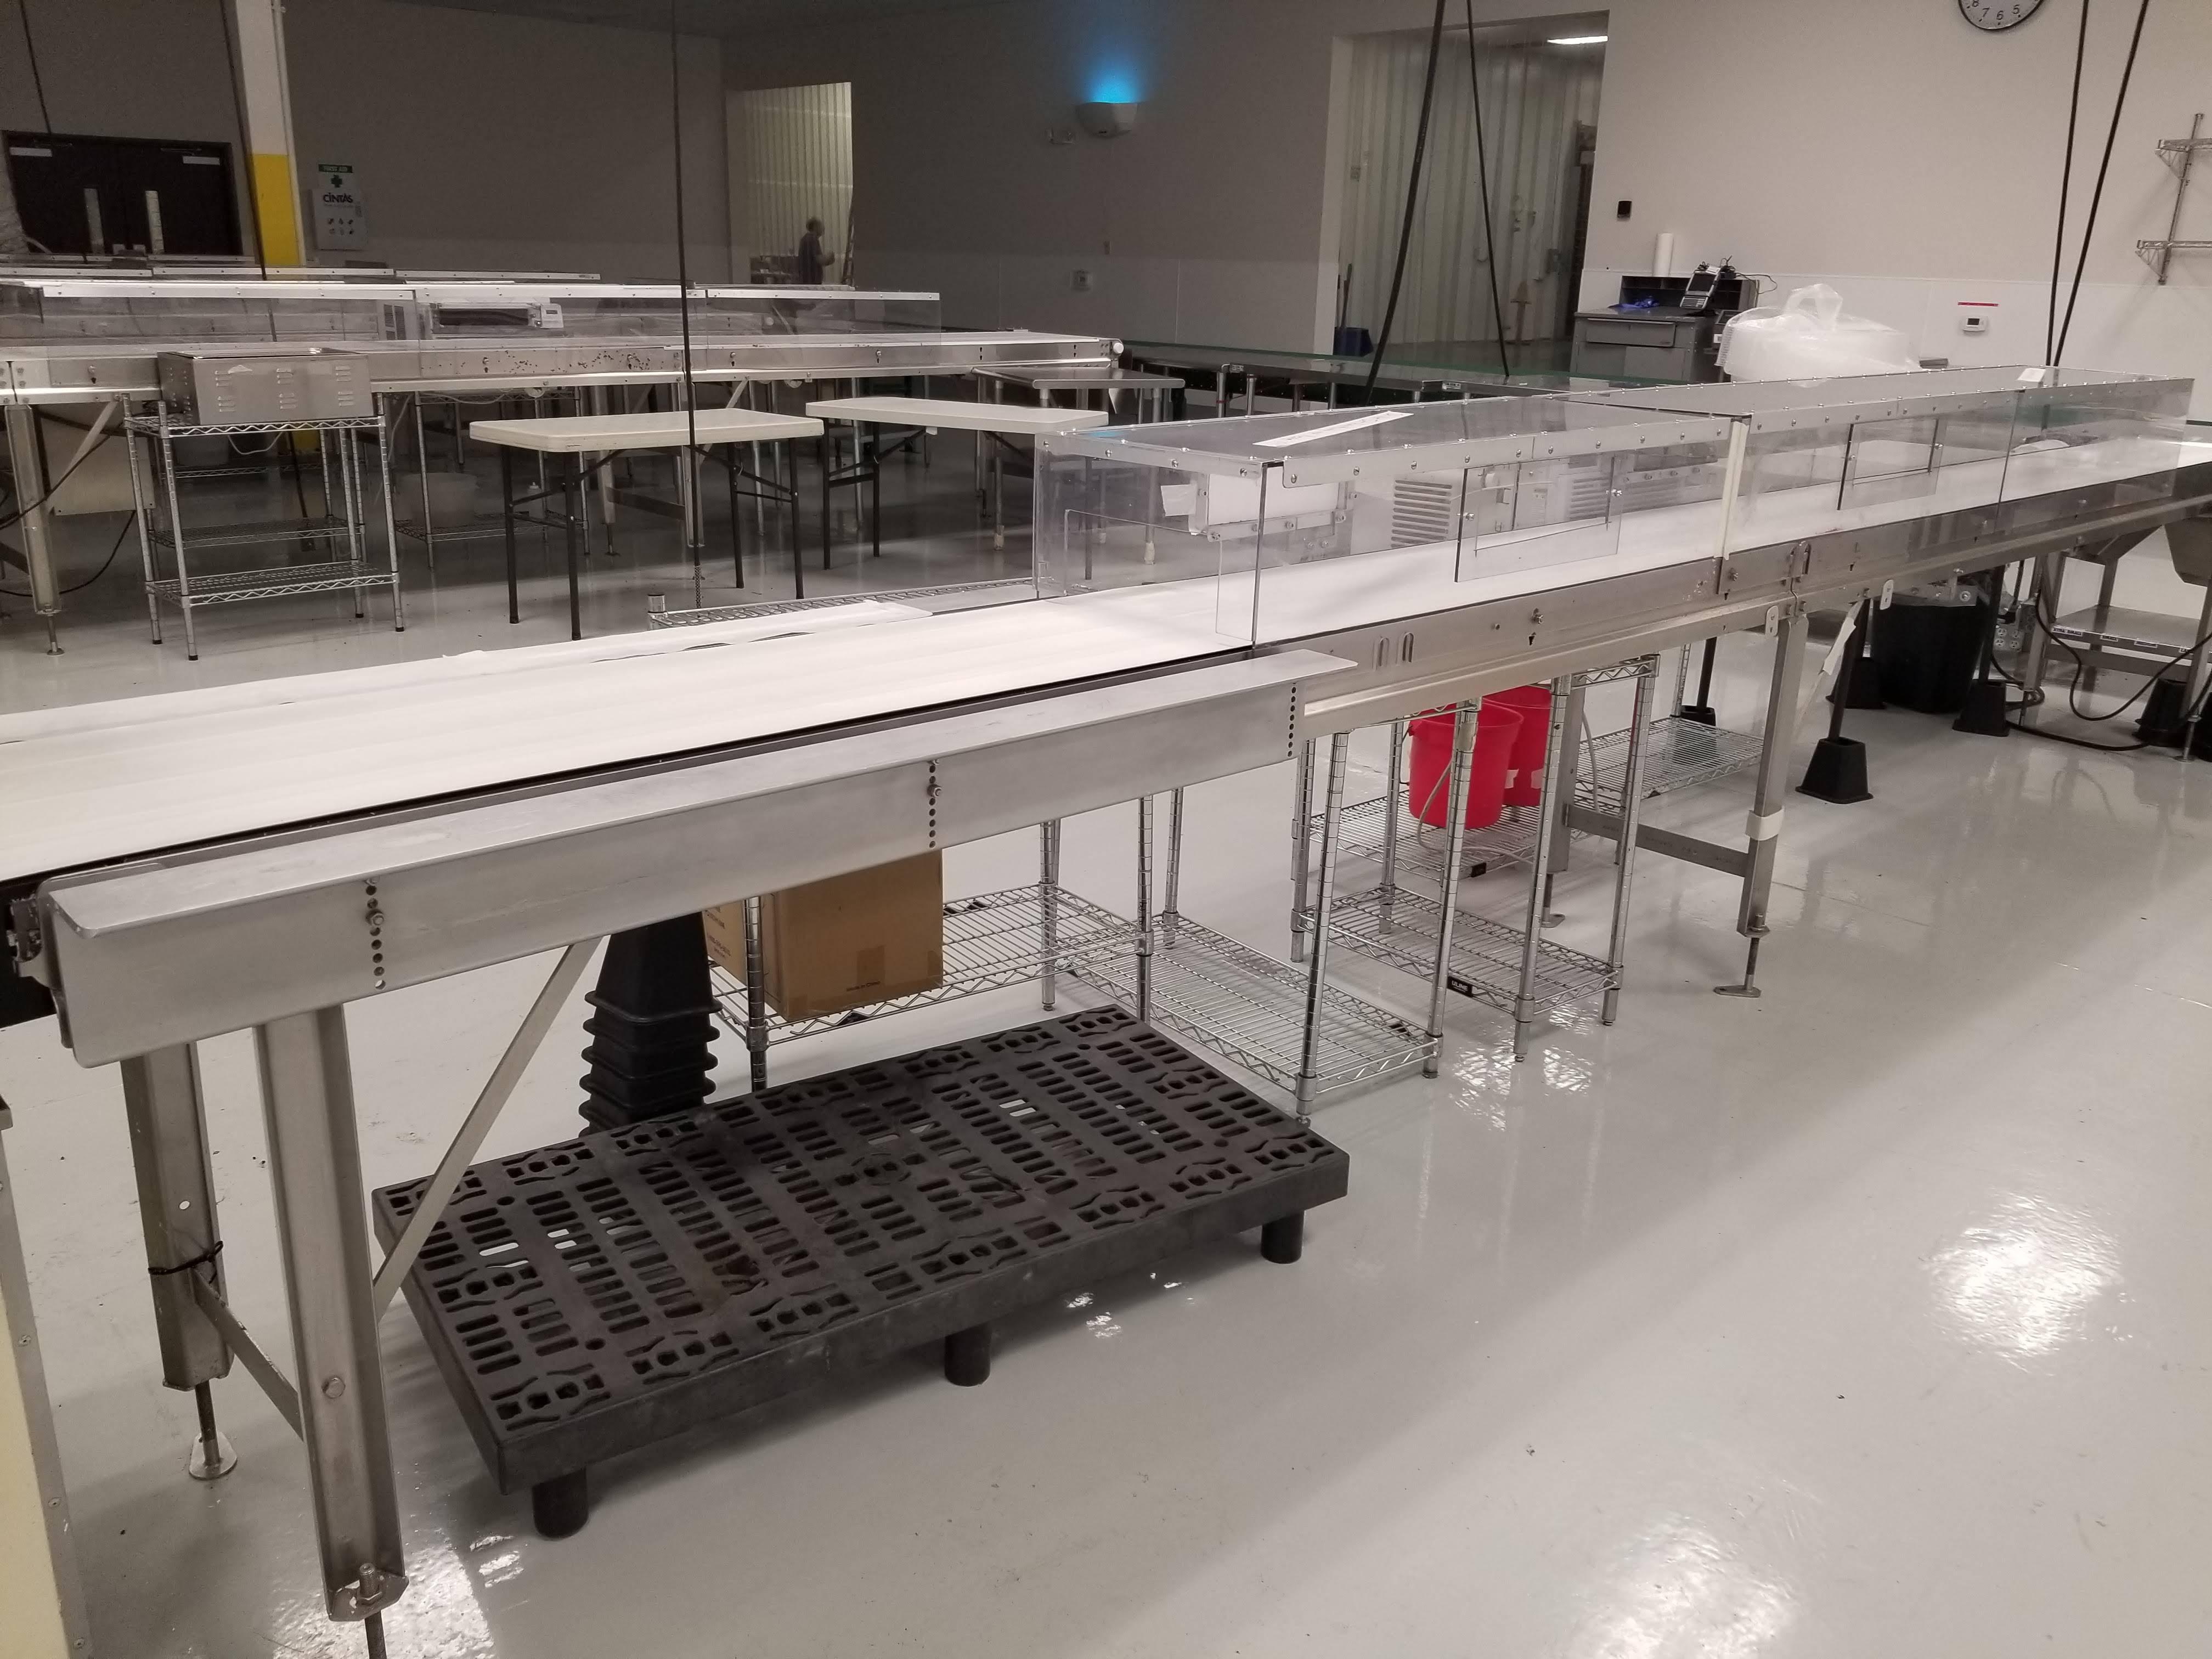 "Lot 21a - Dorner 27"" wide x 26-ft long Ambient Cooling Conveyor"